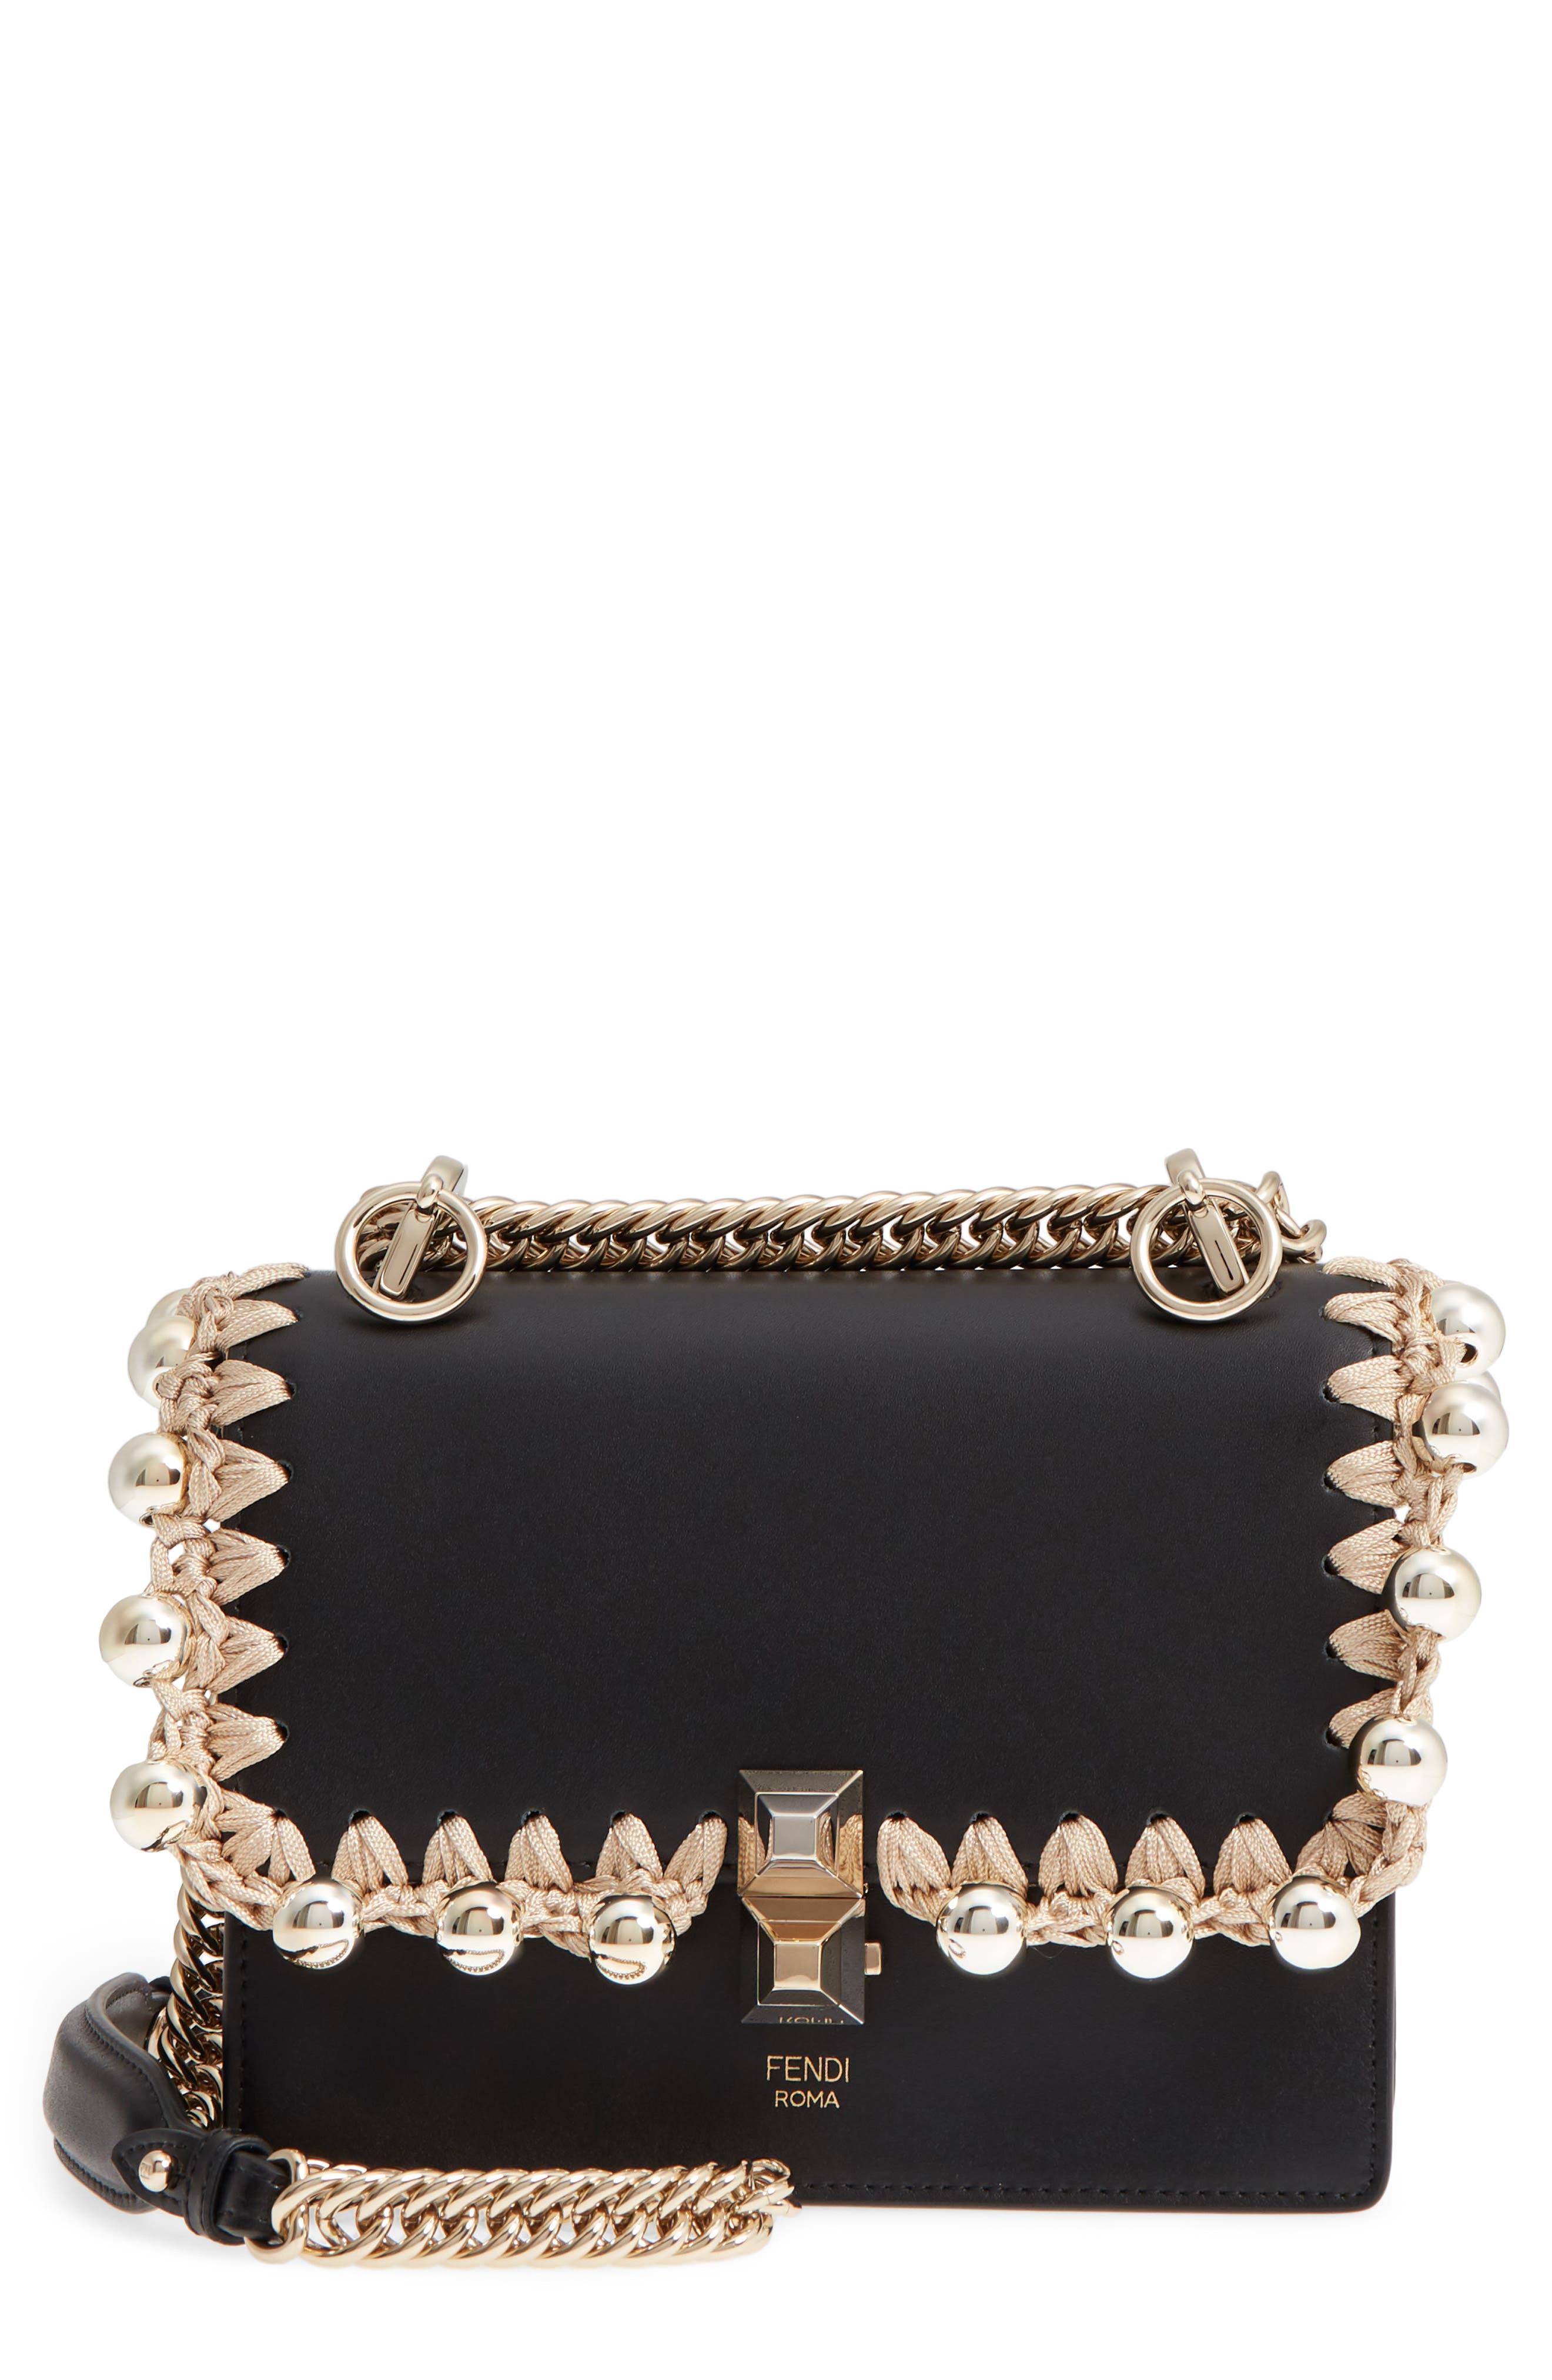 Small Kan I Leather Shoulder Bag,                             Main thumbnail 1, color,                             NERO/ ORO/ CHIARO